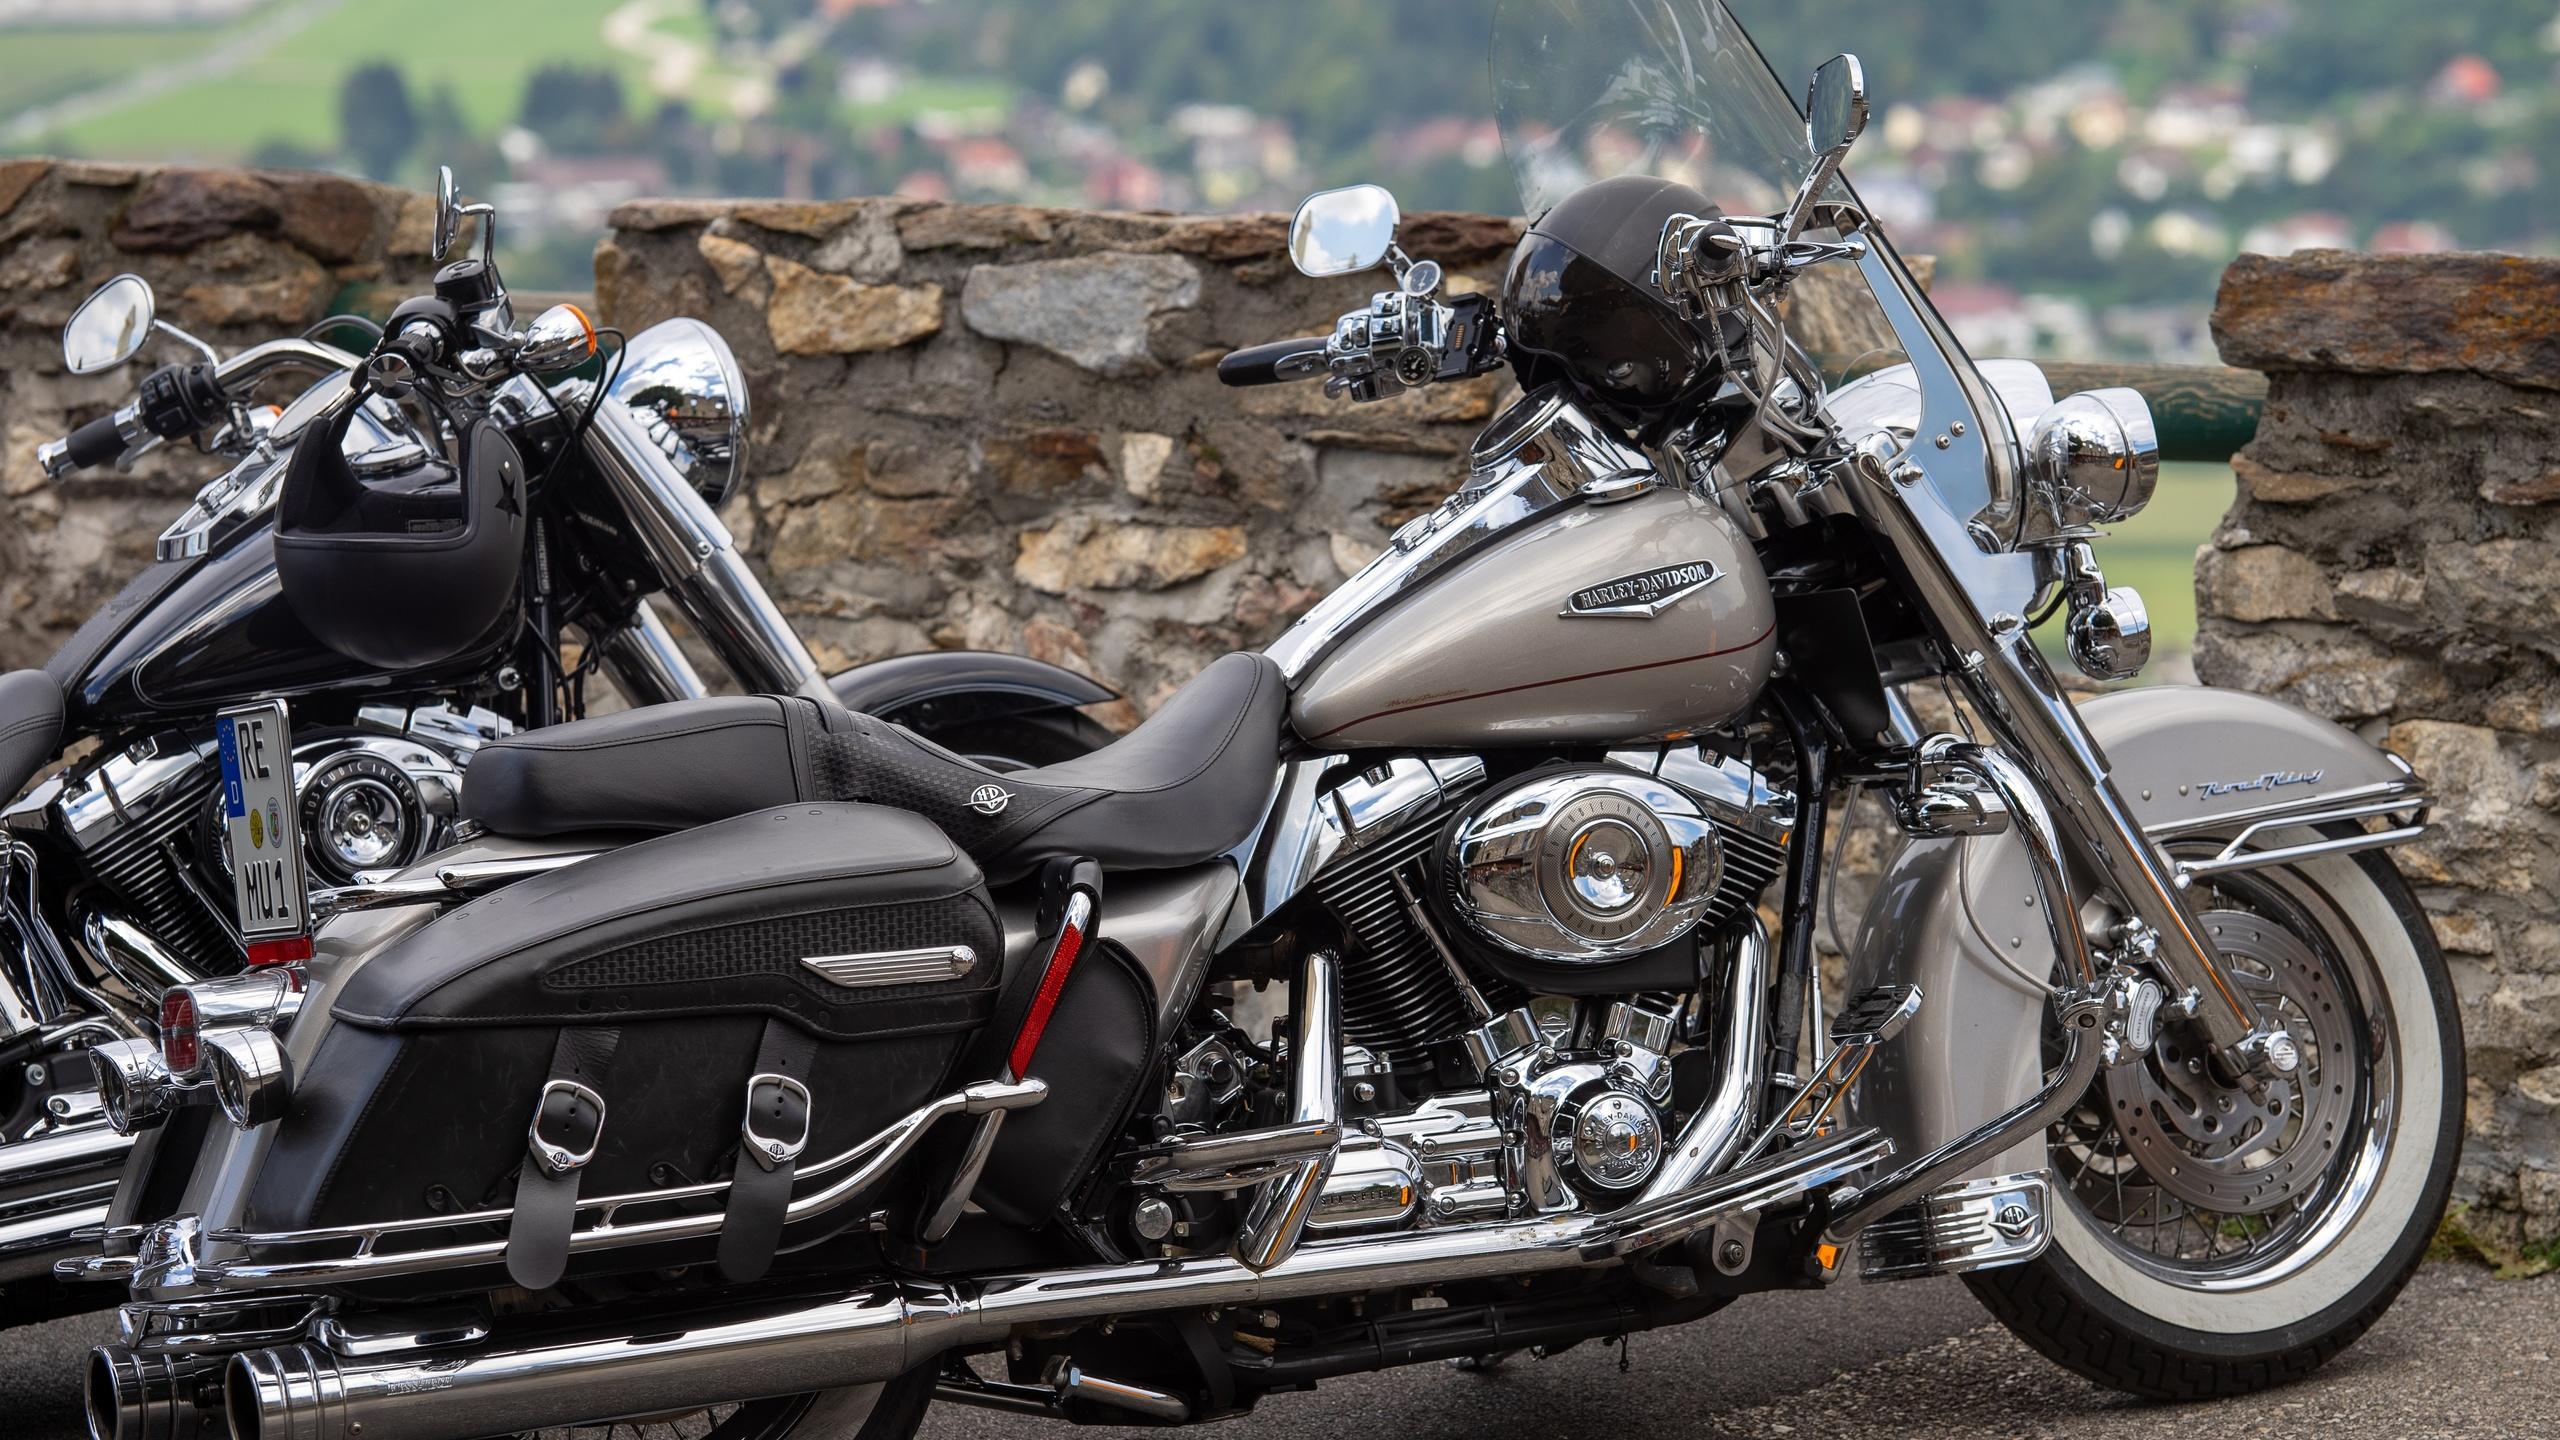 harley-davidson, харлей дэвидсон, мотоцикл